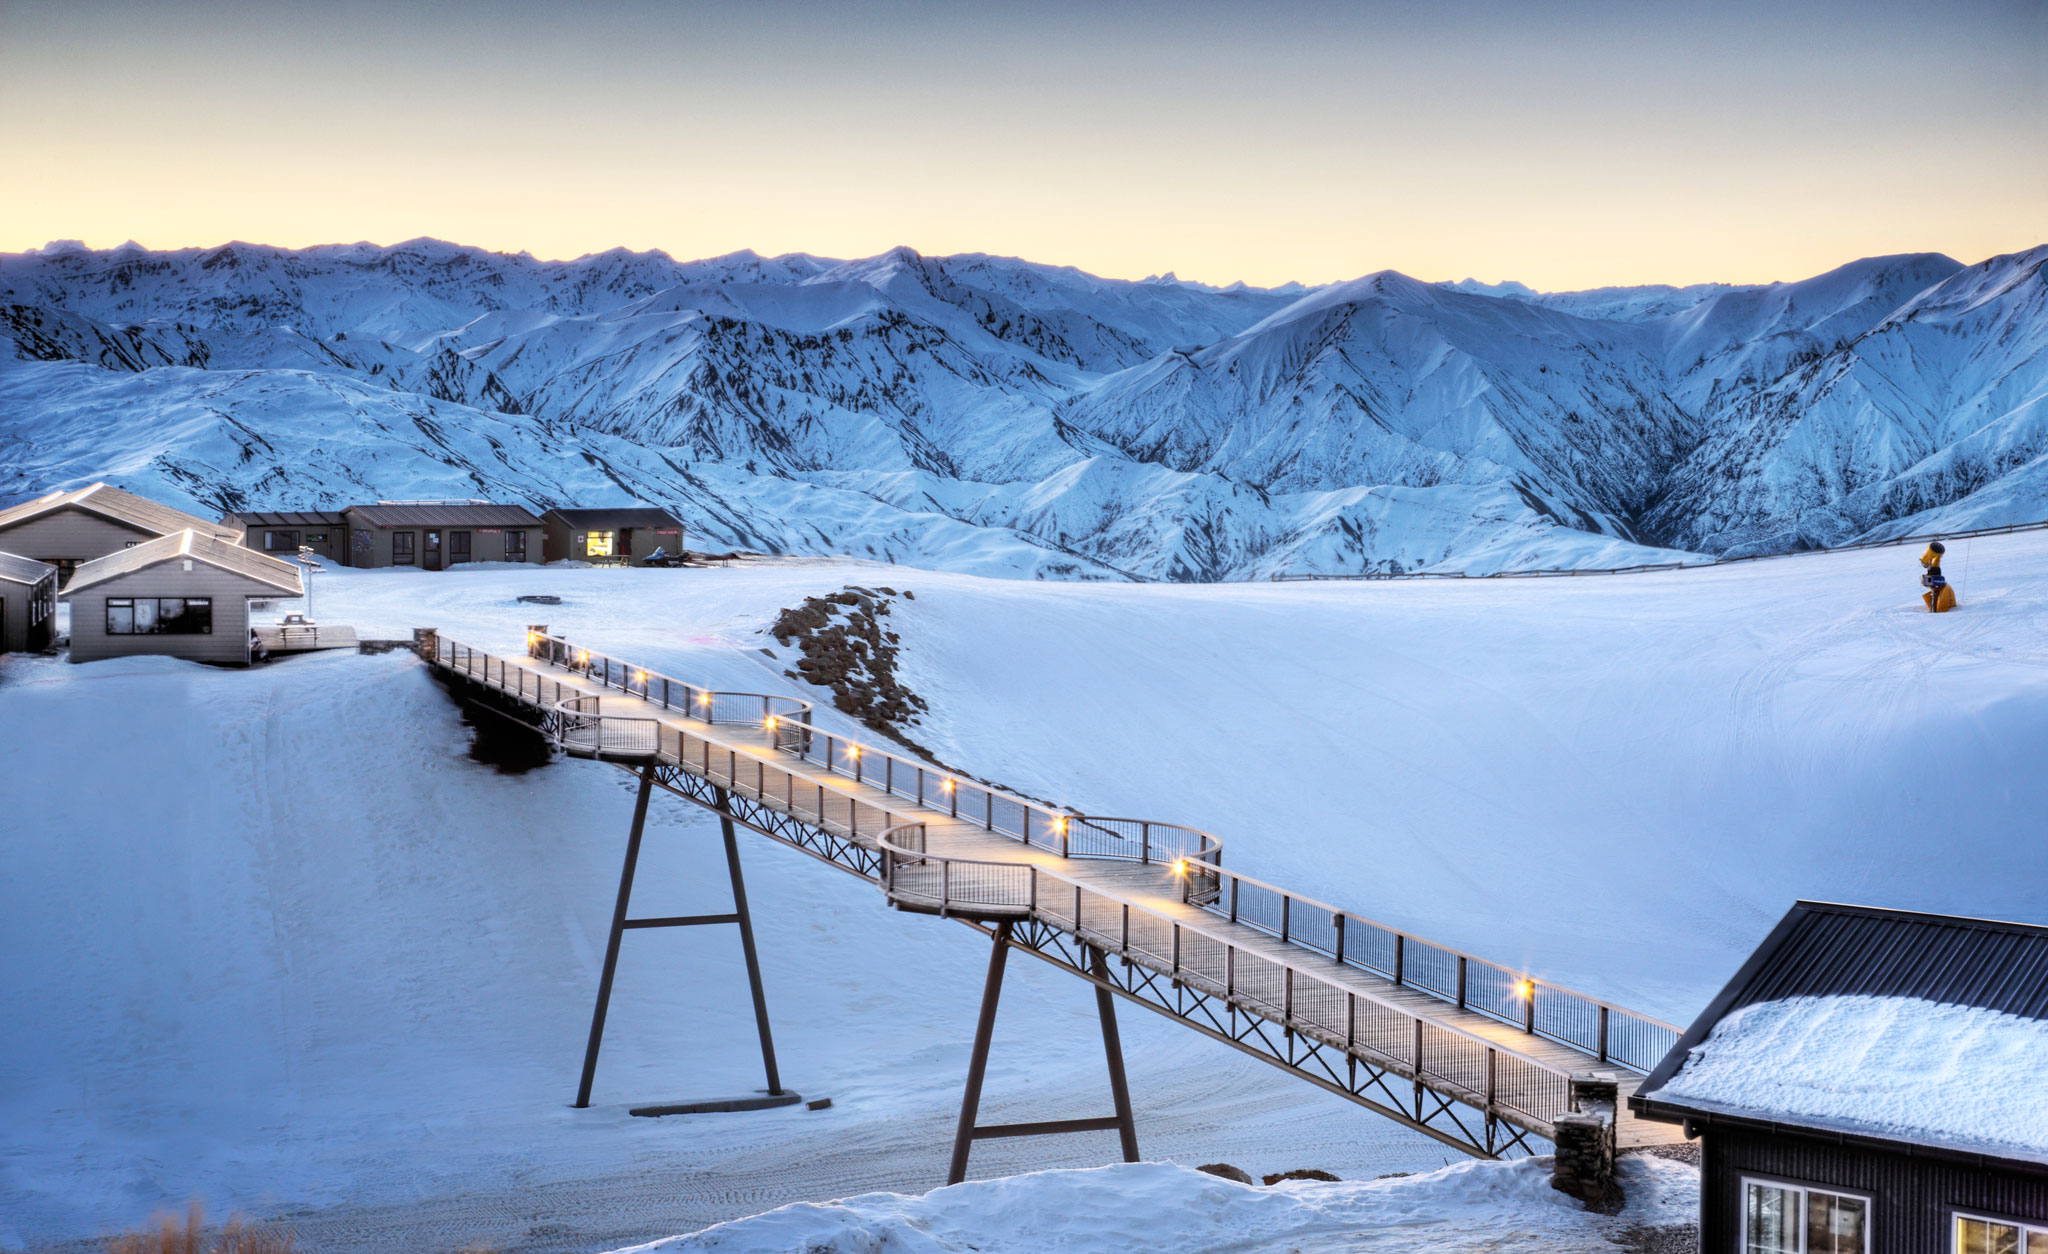 New Zealand Snow Park